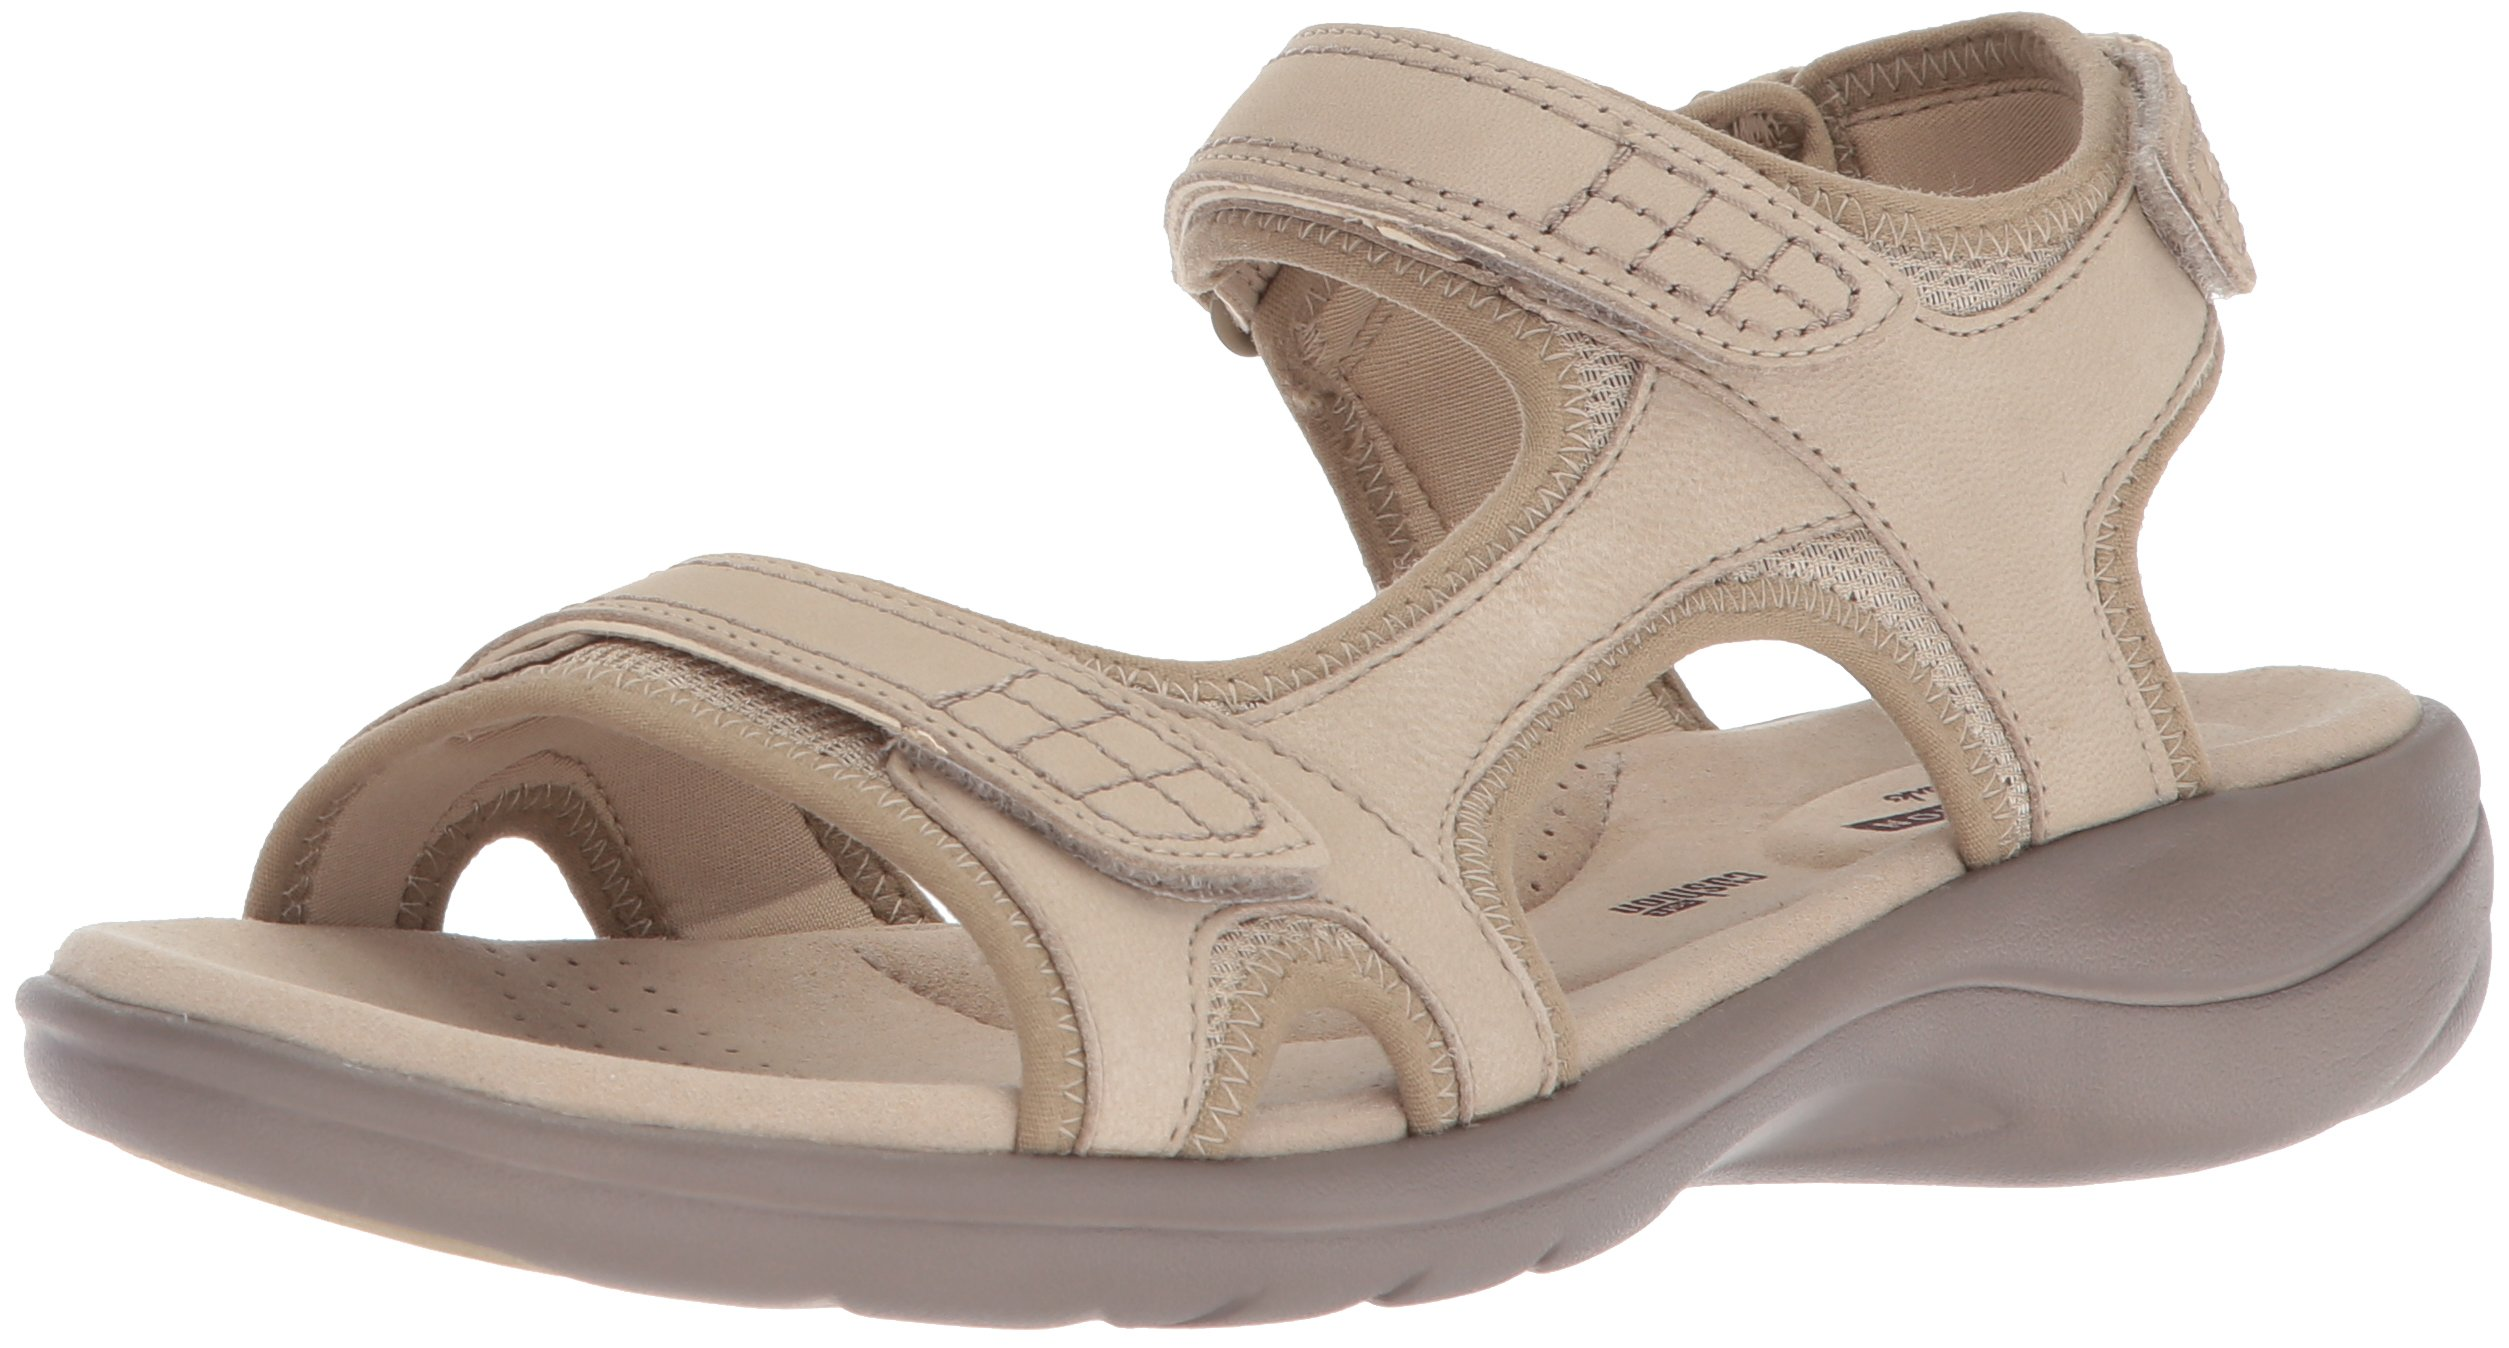 CLARKS Women's Saylie Jade Sandal, Sand, 8.5 Medium US